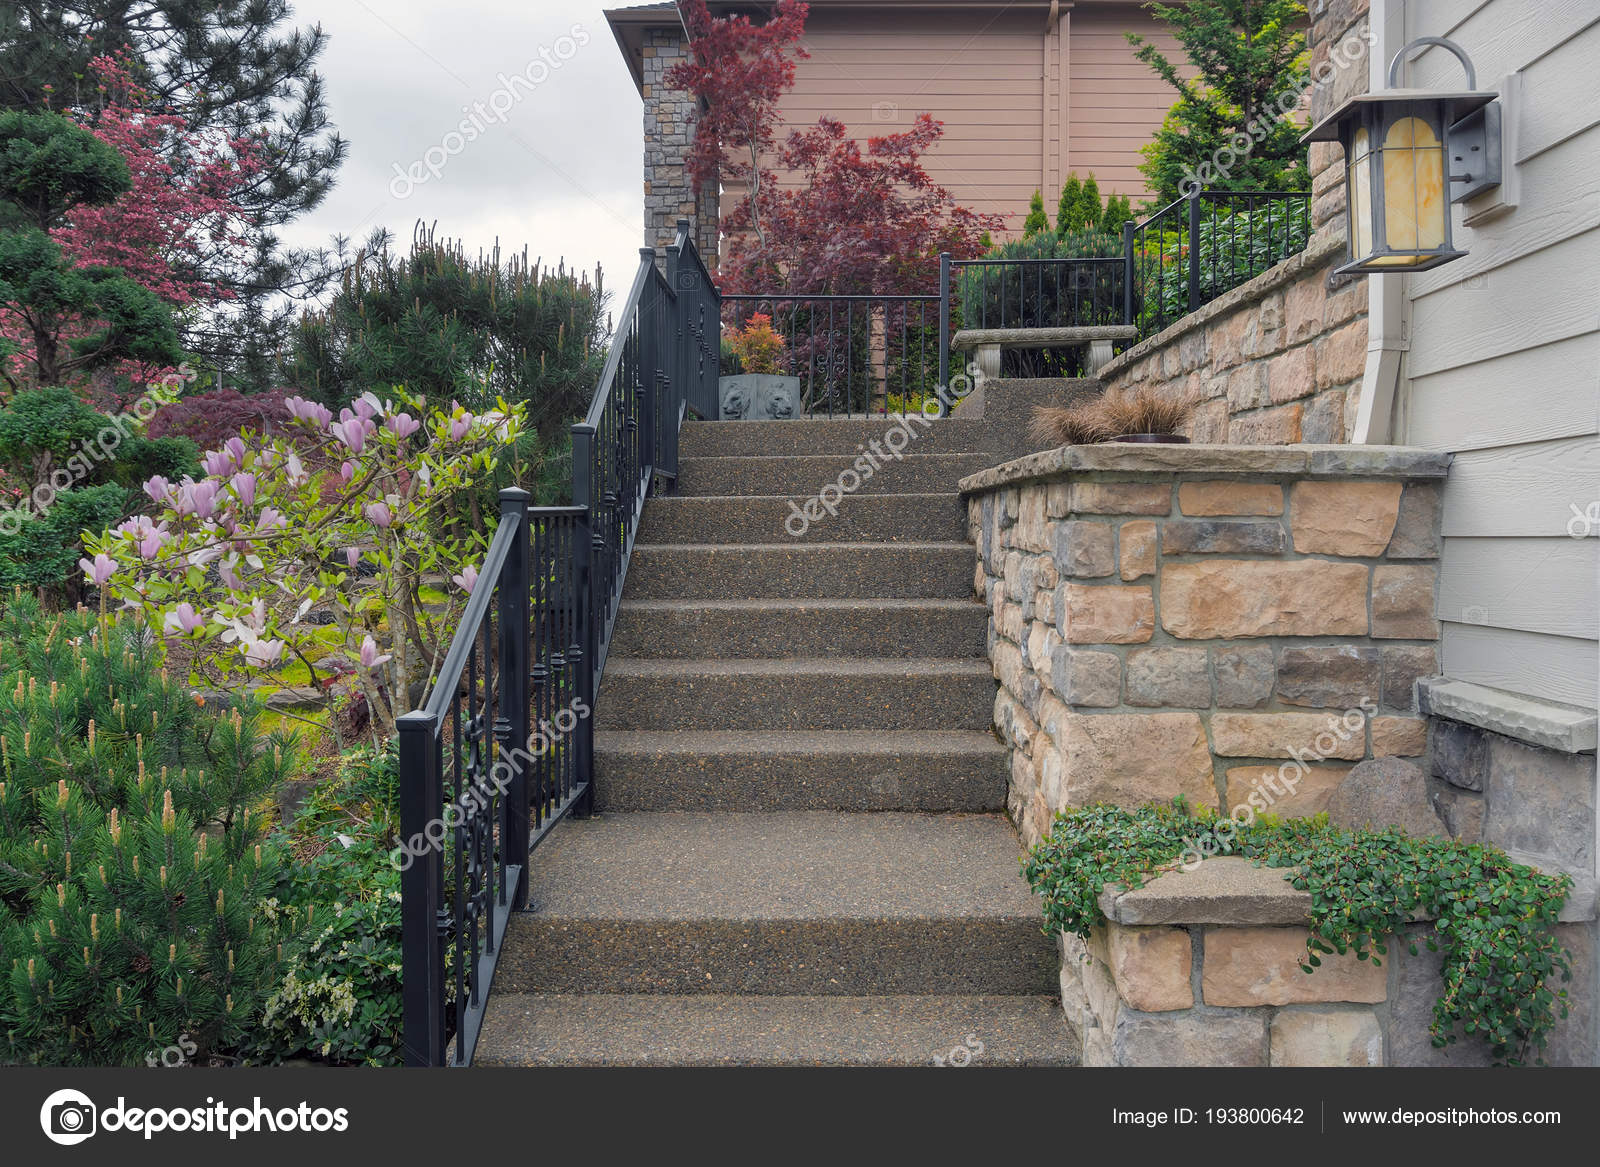 beton treppenstufen zum hauseingang — stockfoto © jpldesigns #193800642